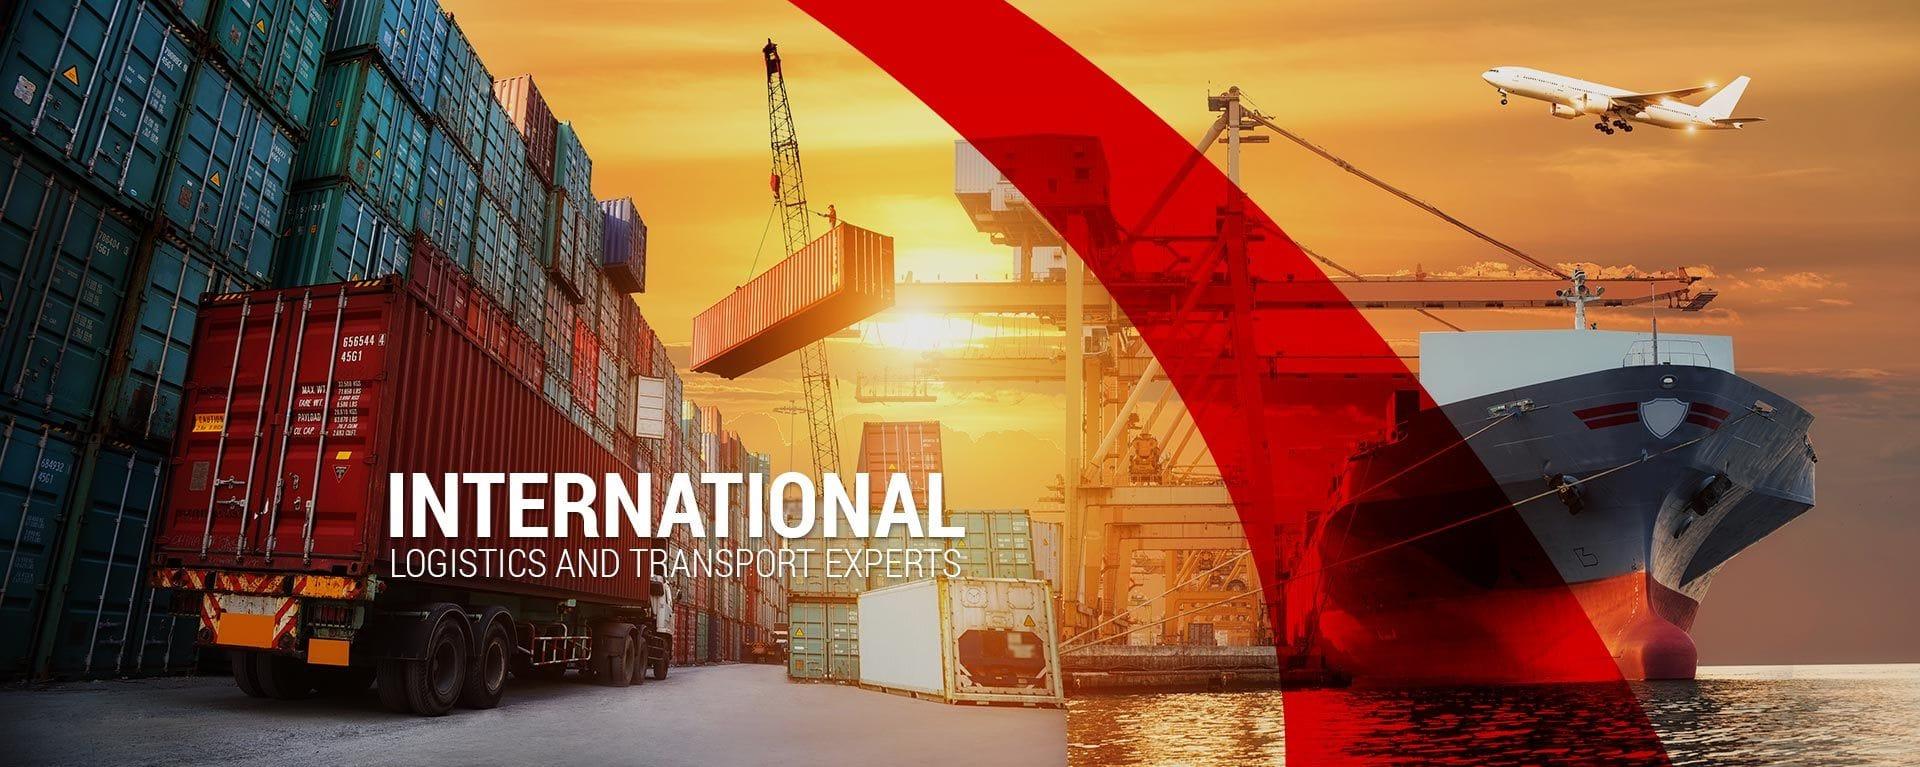 Scorpion International International Logistics and Transport experts